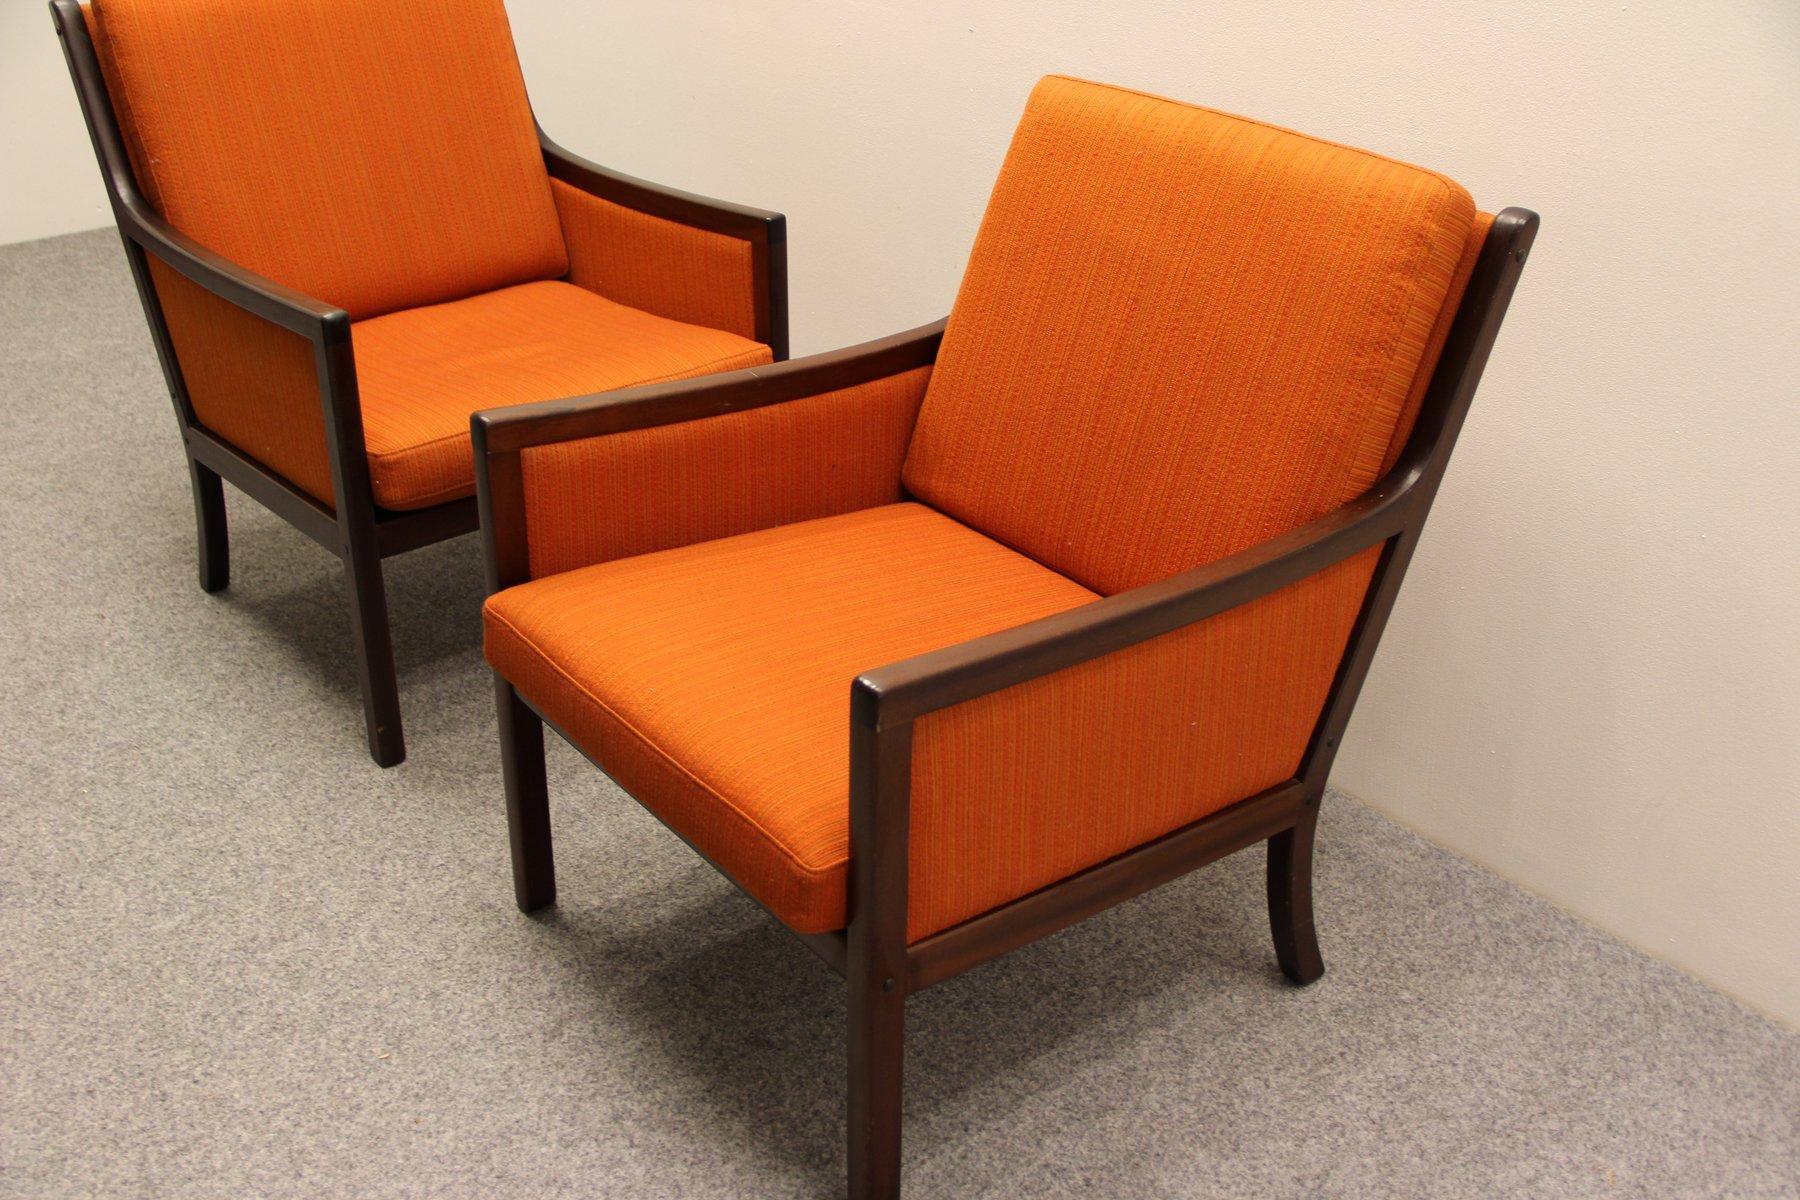 mahagoni lounge sessel von ole wanscher f r p jeppesen bei pamono kaufen. Black Bedroom Furniture Sets. Home Design Ideas